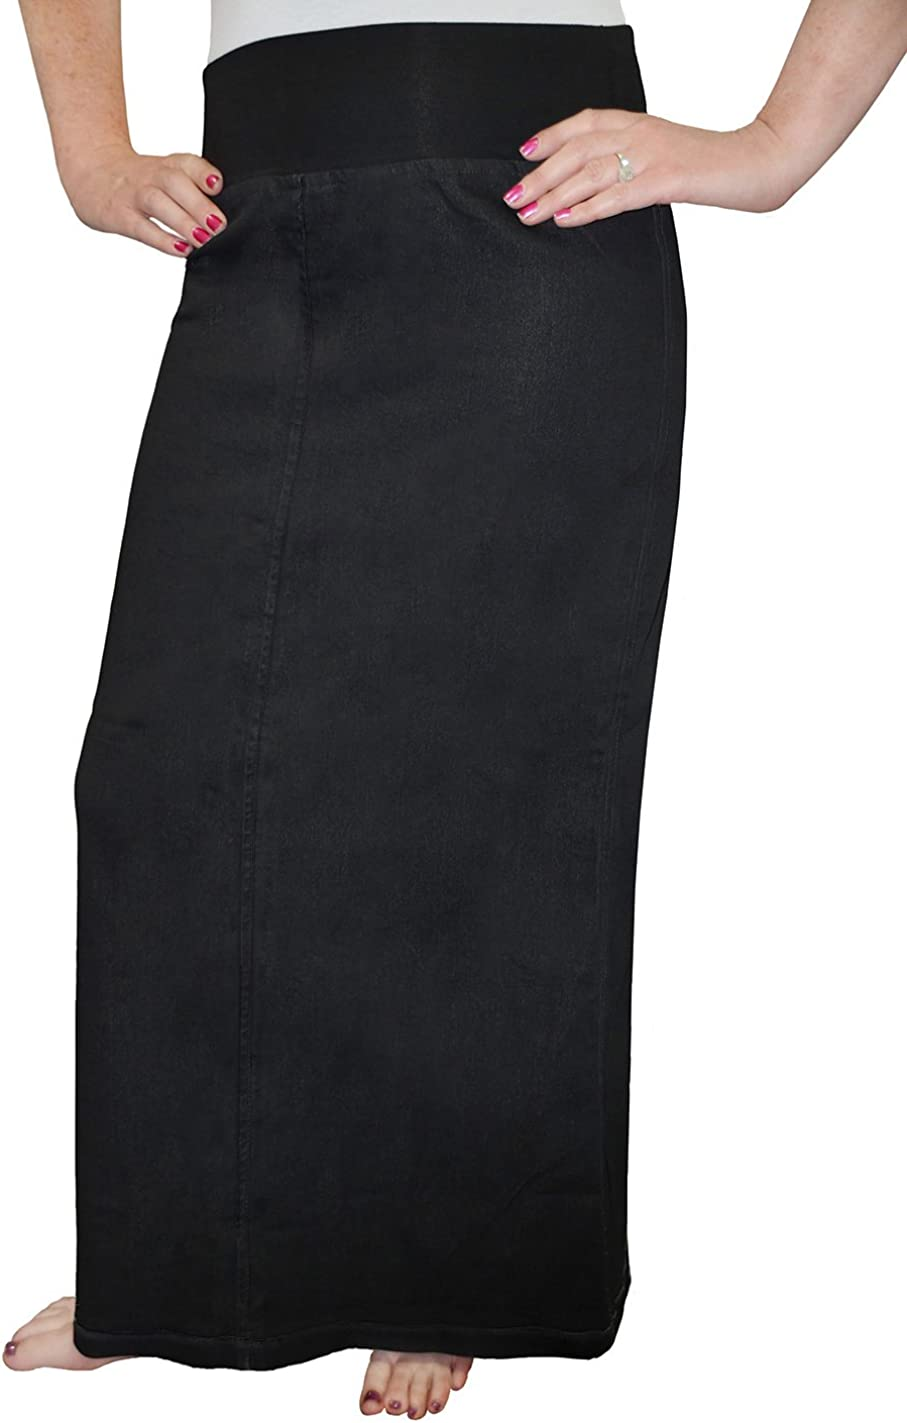 Kosher Casual Women's Modest Straight Maxi Length Denim Skirt Stretch Waistband No Slits